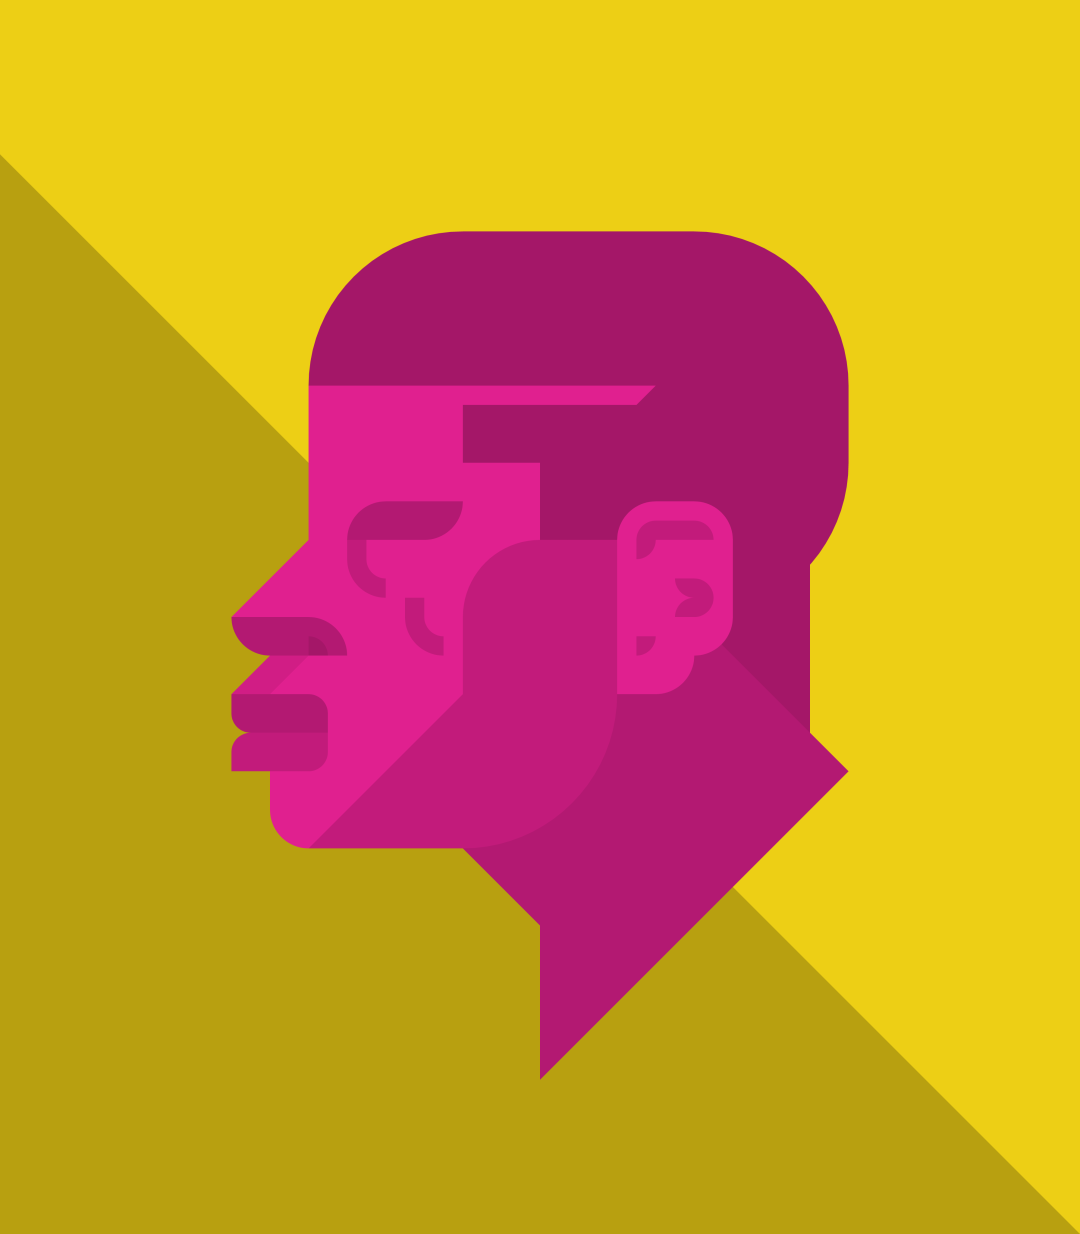 Profile of man #3